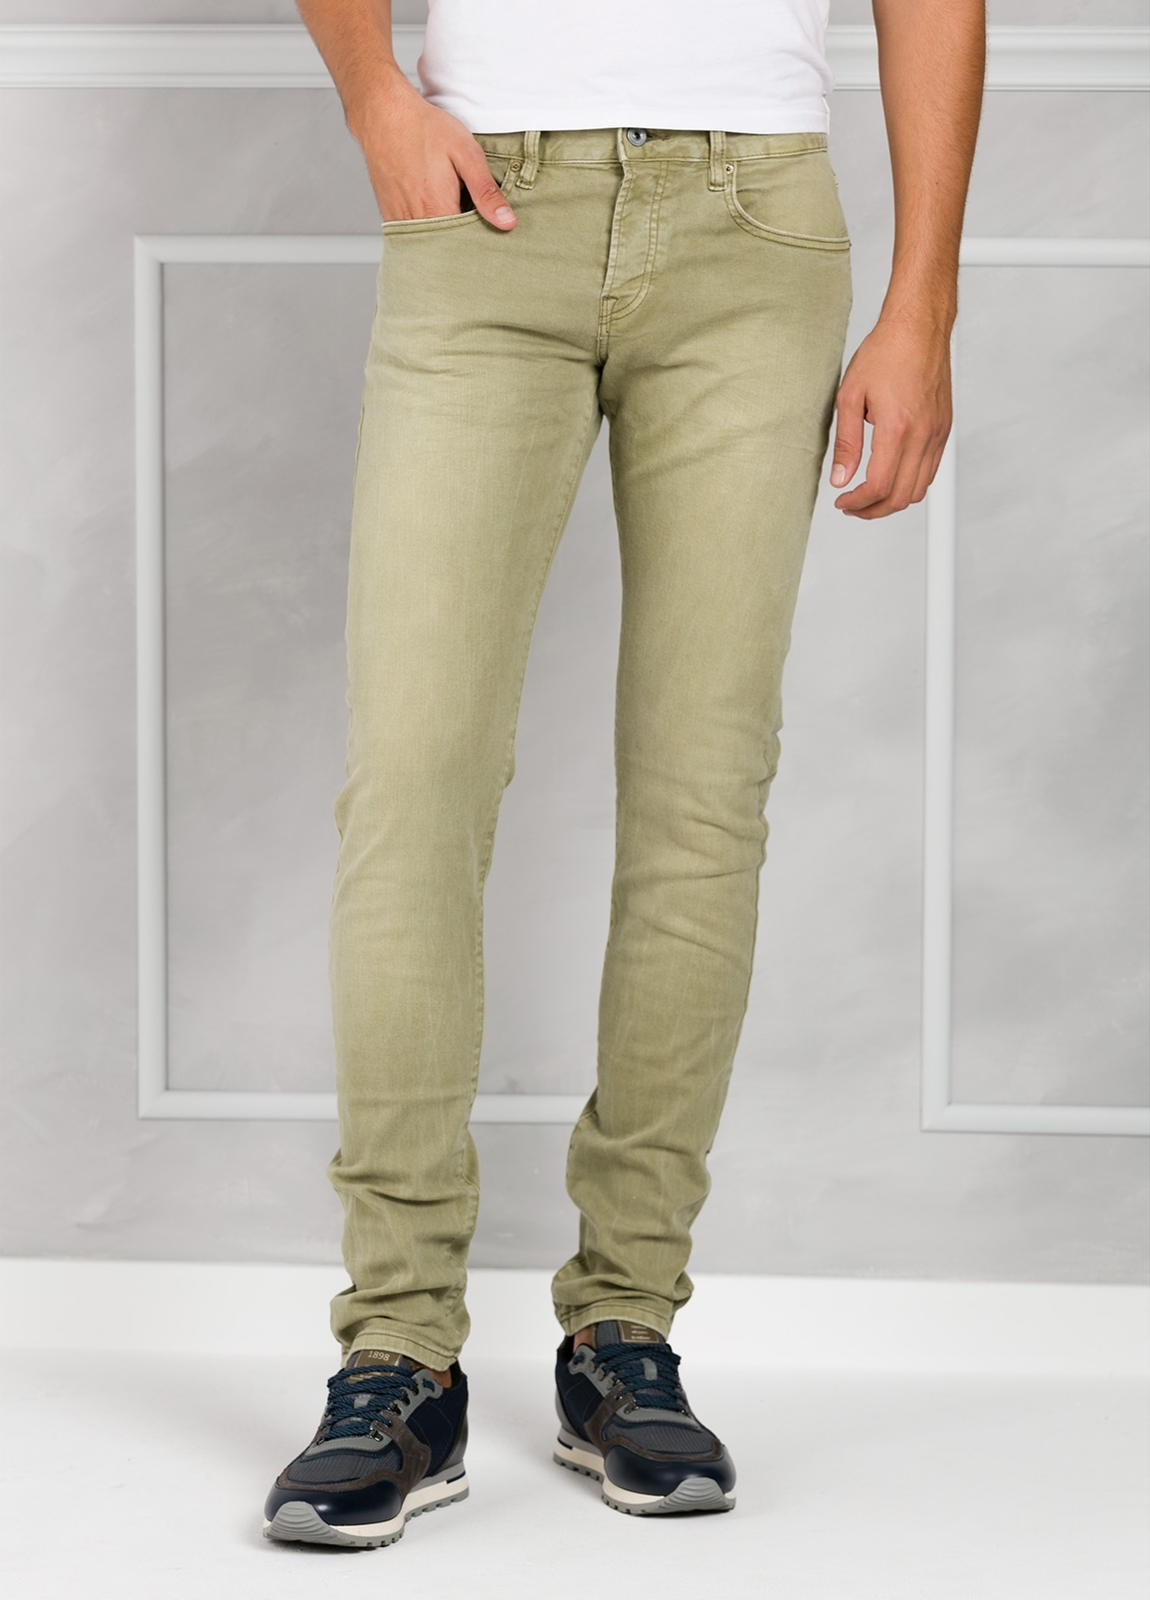 Pantalón 5 bolsillos regular slim fit denim elástico teñido en prenda color verde. 90% Algodón 8% Poliéster 2% Elastano. - Ítem2